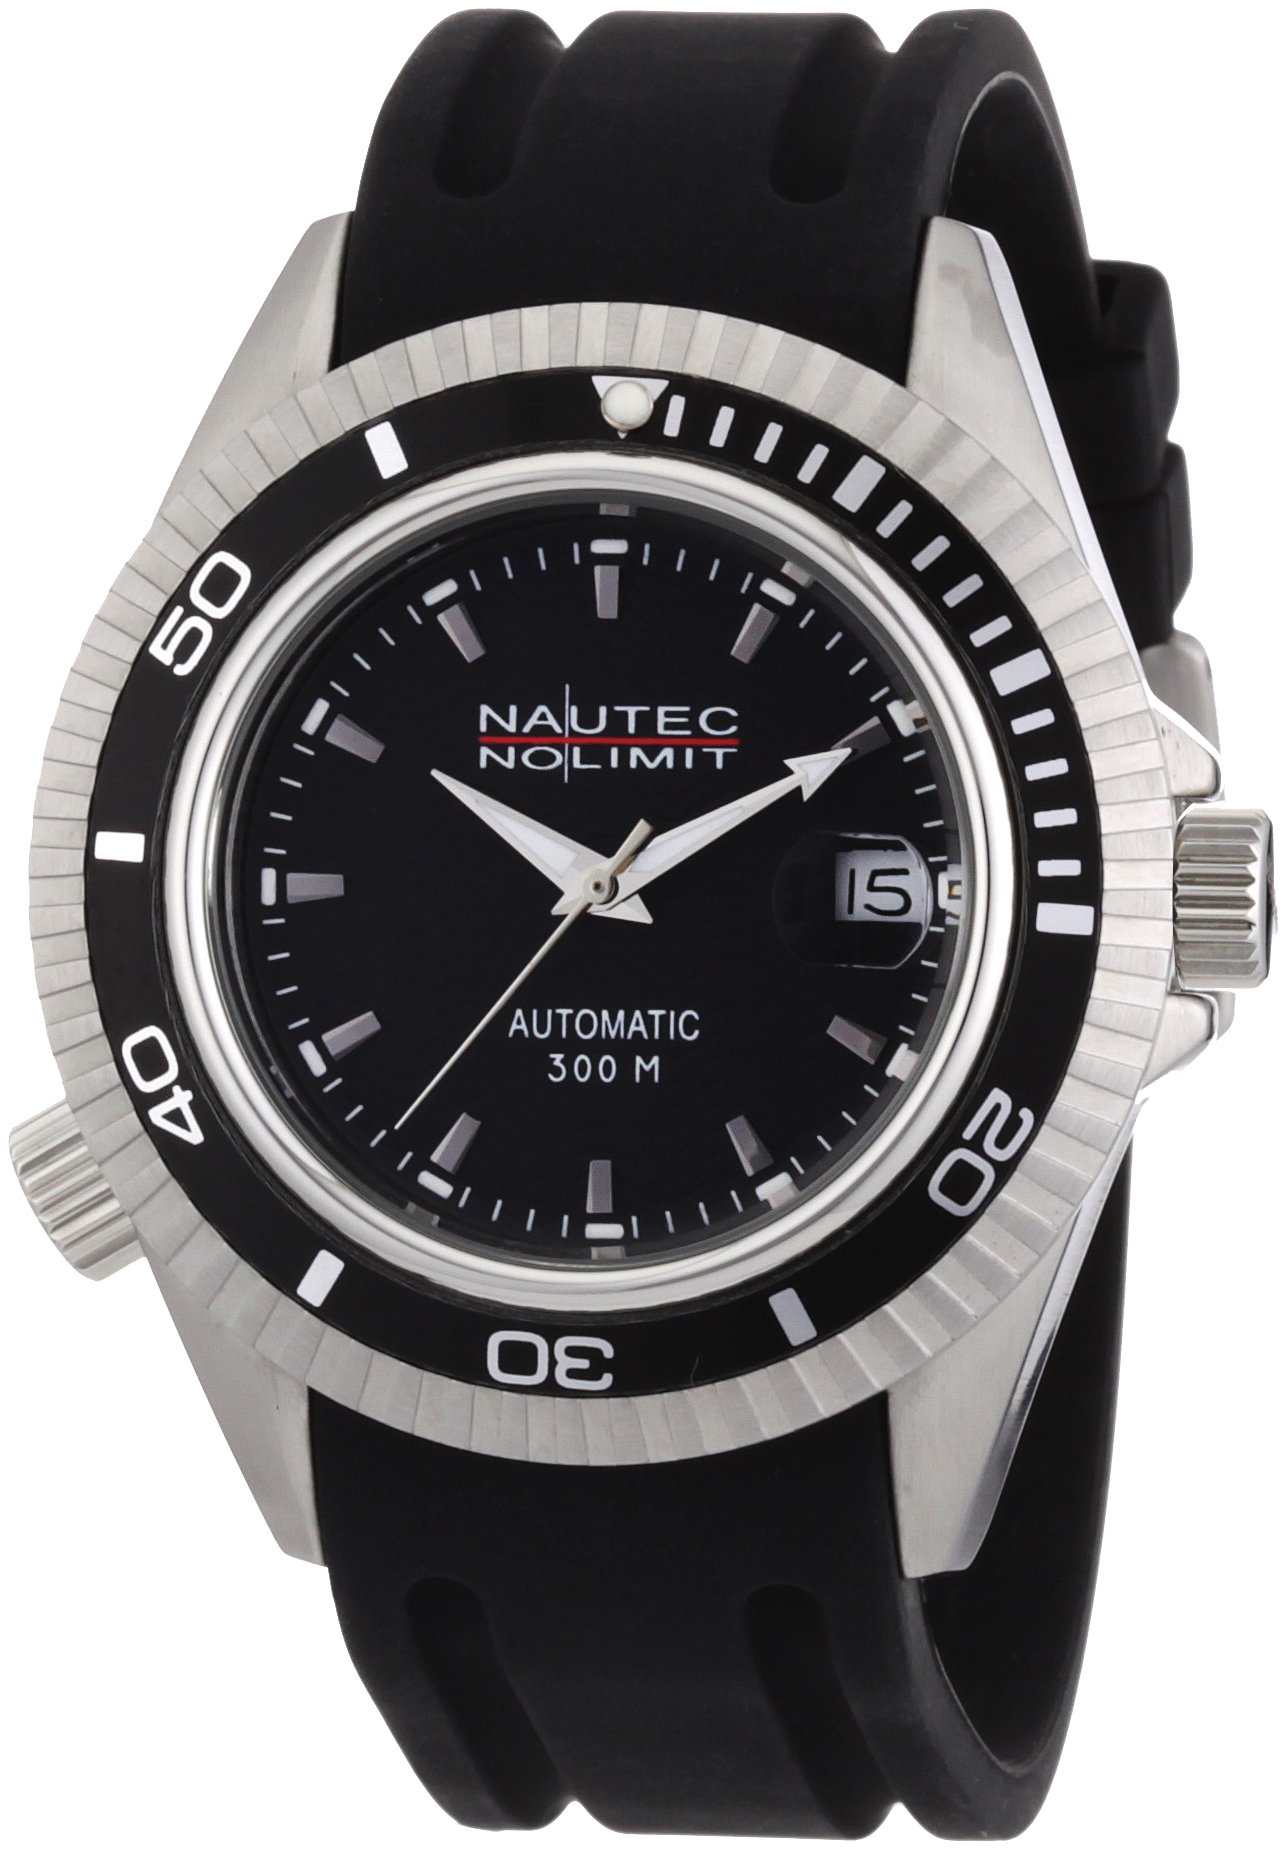 Nautec-No-Limit-Herren-Armbanduhr-Shore-Analog-Automatik-SH-ATRBSTBKBK